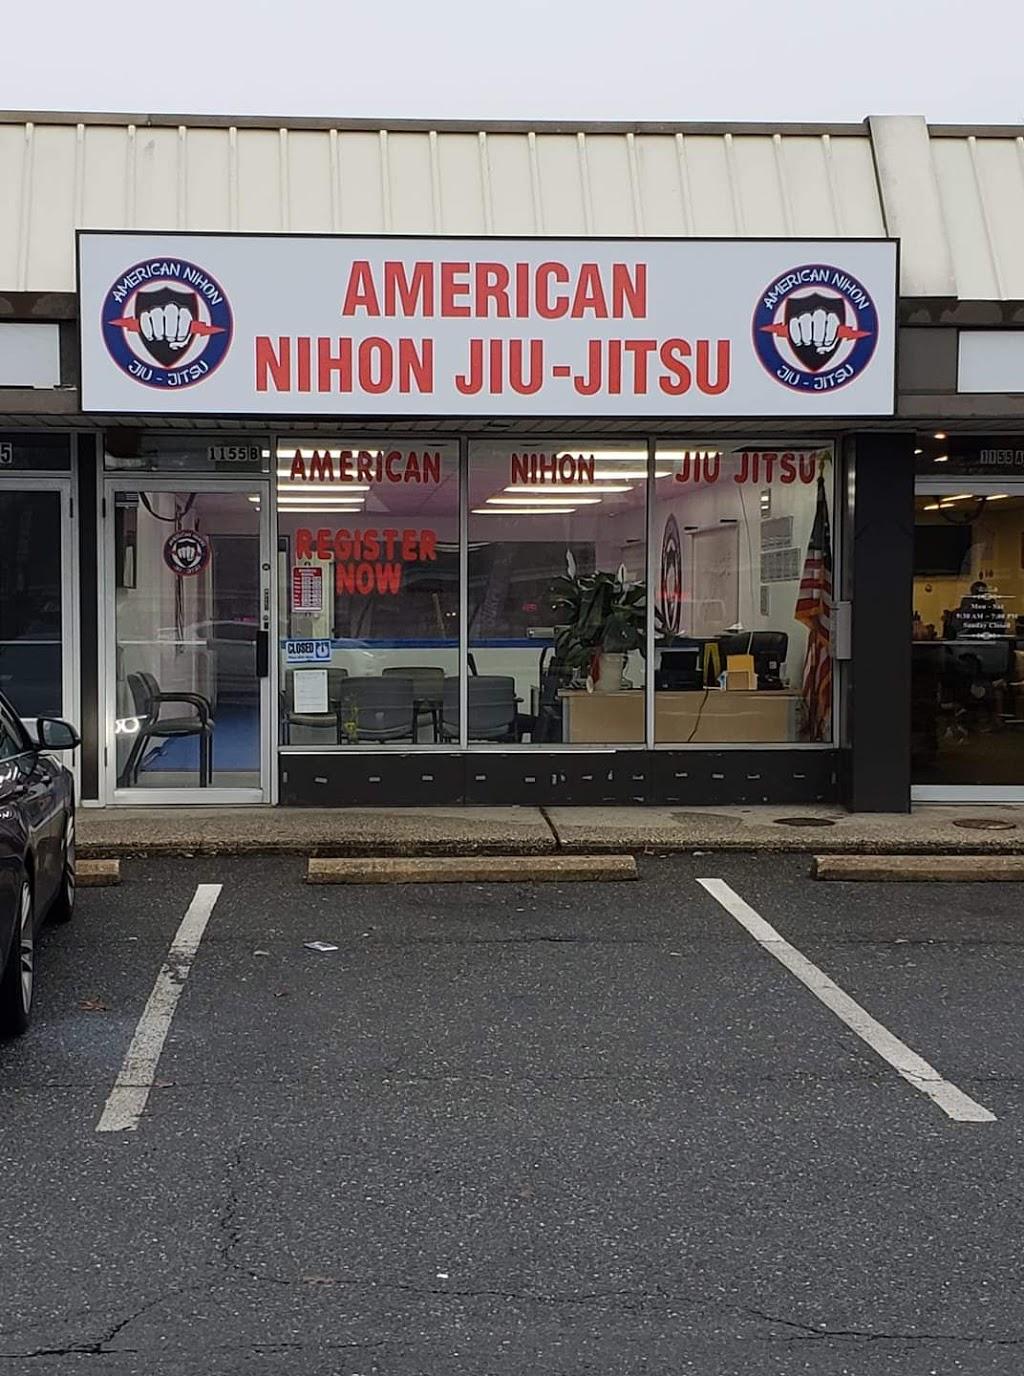 da5dca99ff5 American Nihon Jiu-Jitsu - Health